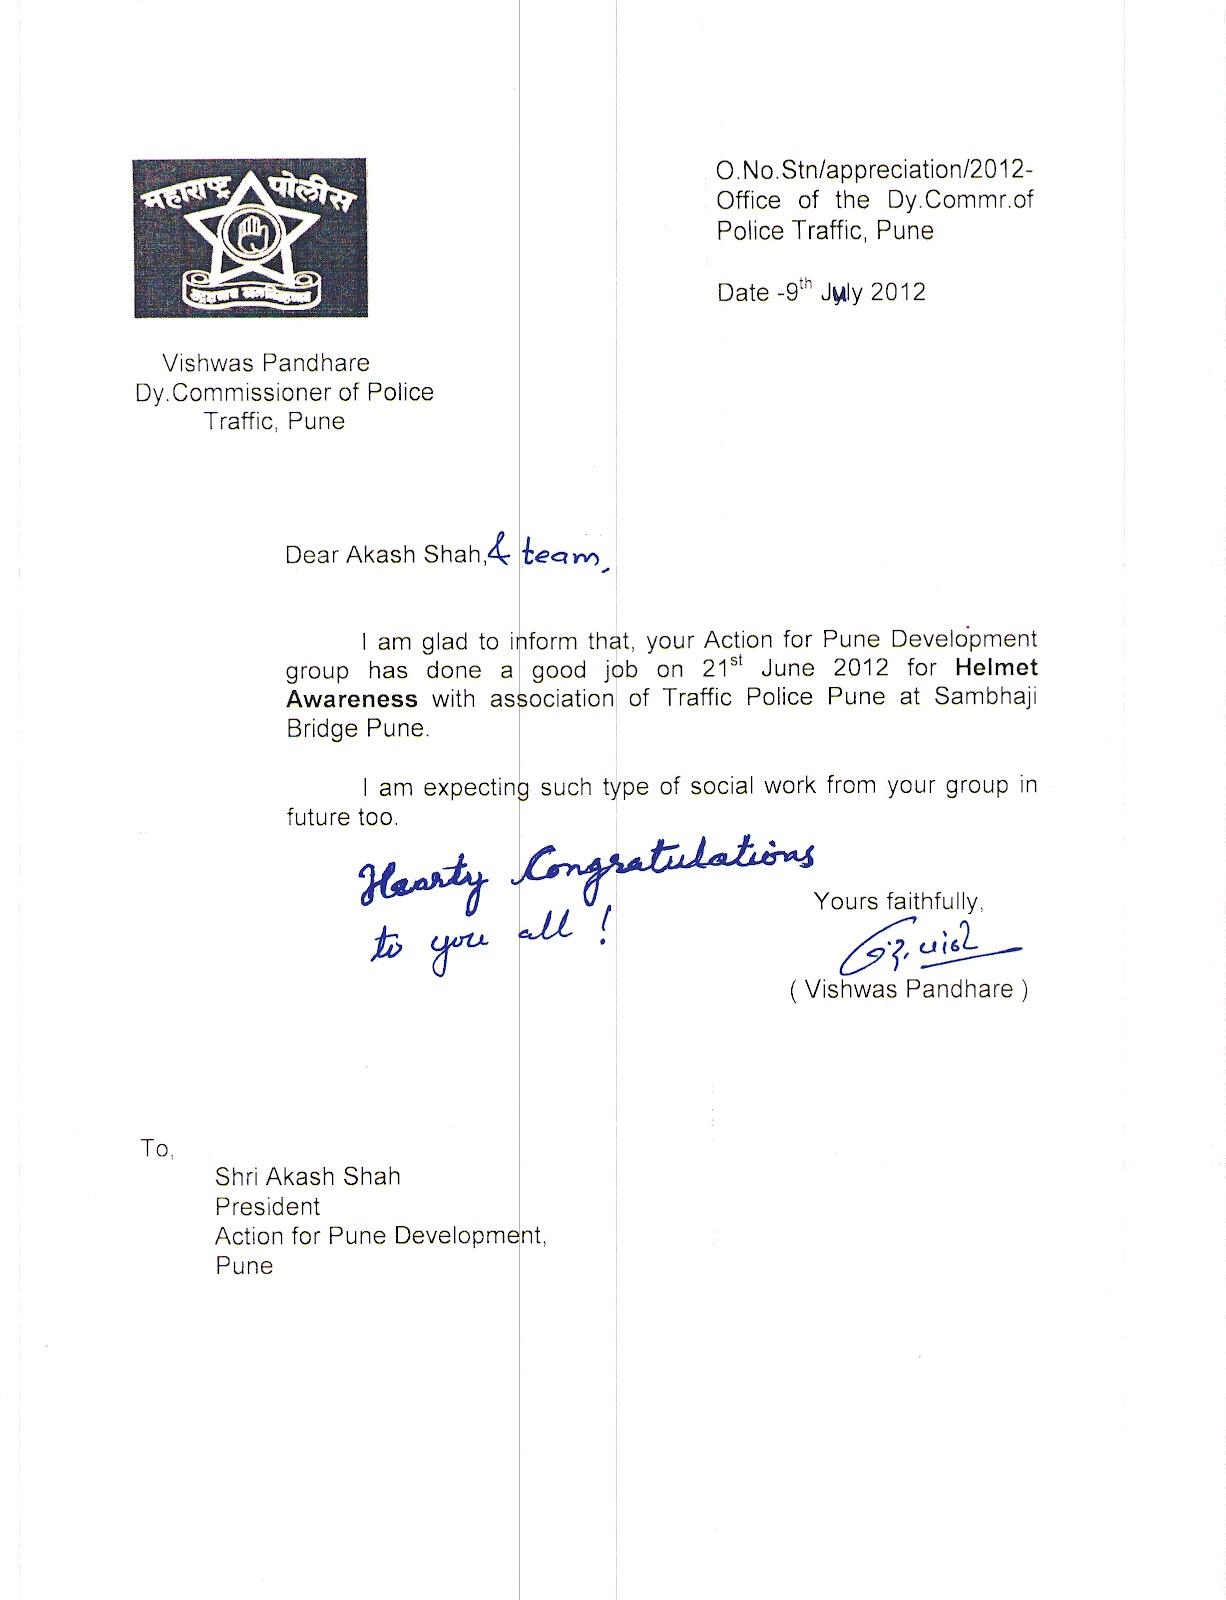 appreciation letter from hon vishwas pandhare dcp pune traffic appreciation letter from hon shri vishwas pandhare sir dcp pune traffic police